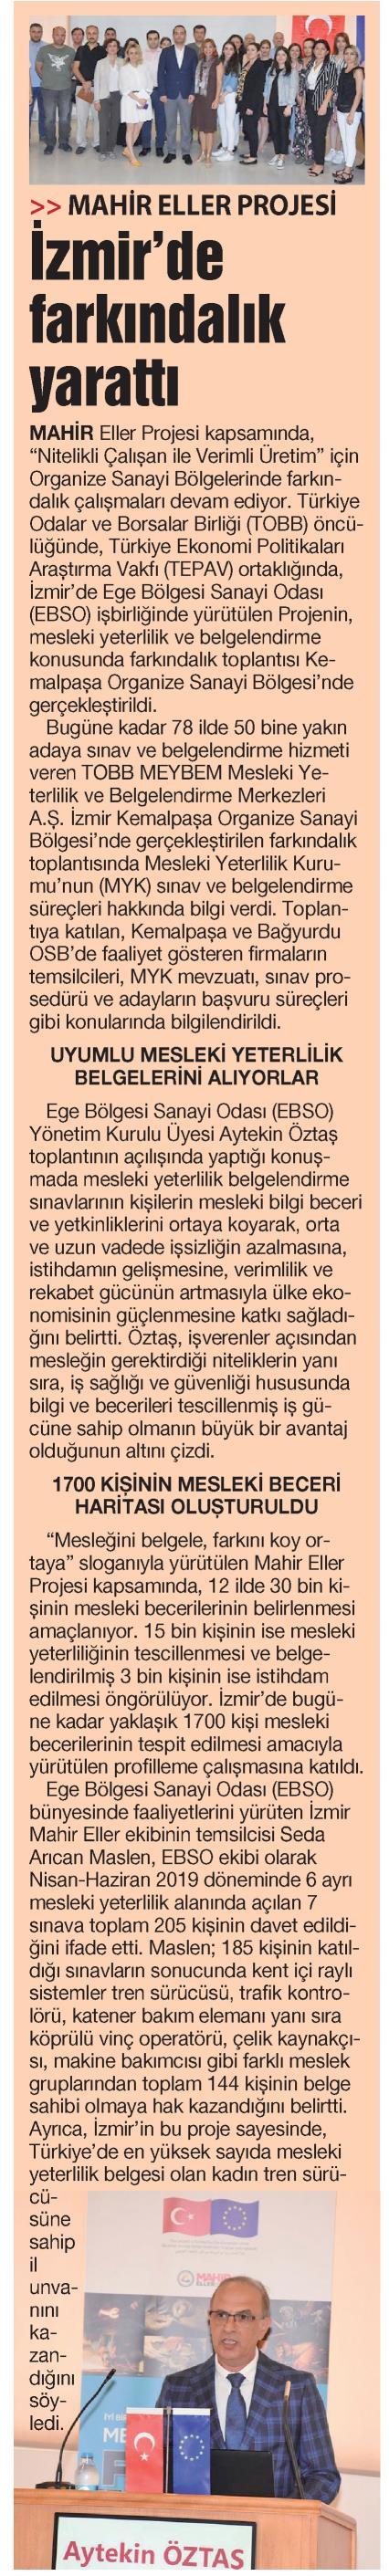 Mahir Eller Projesi İzmir